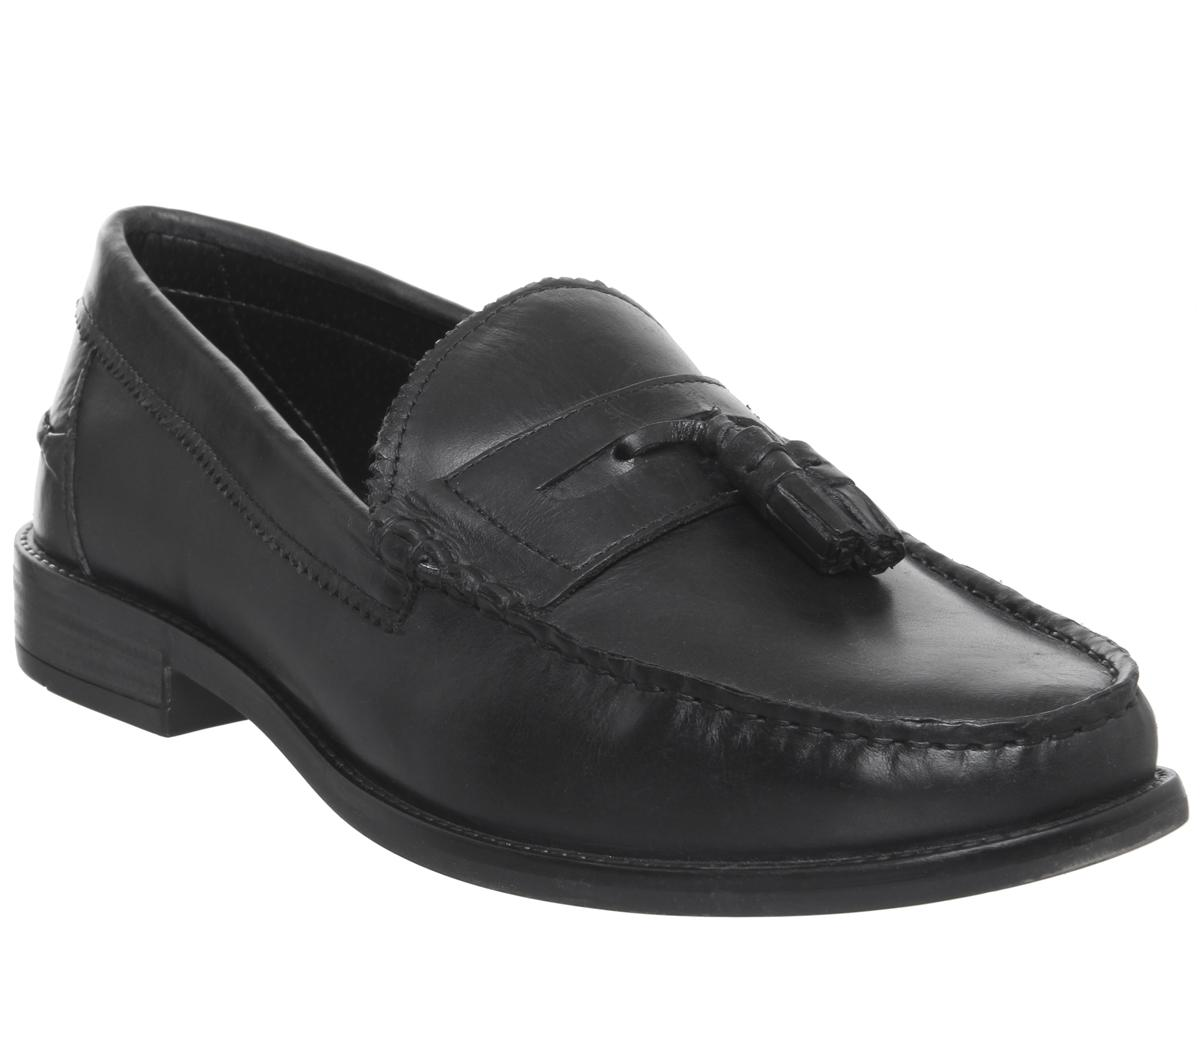 Office Liho Tassel Loafers Black